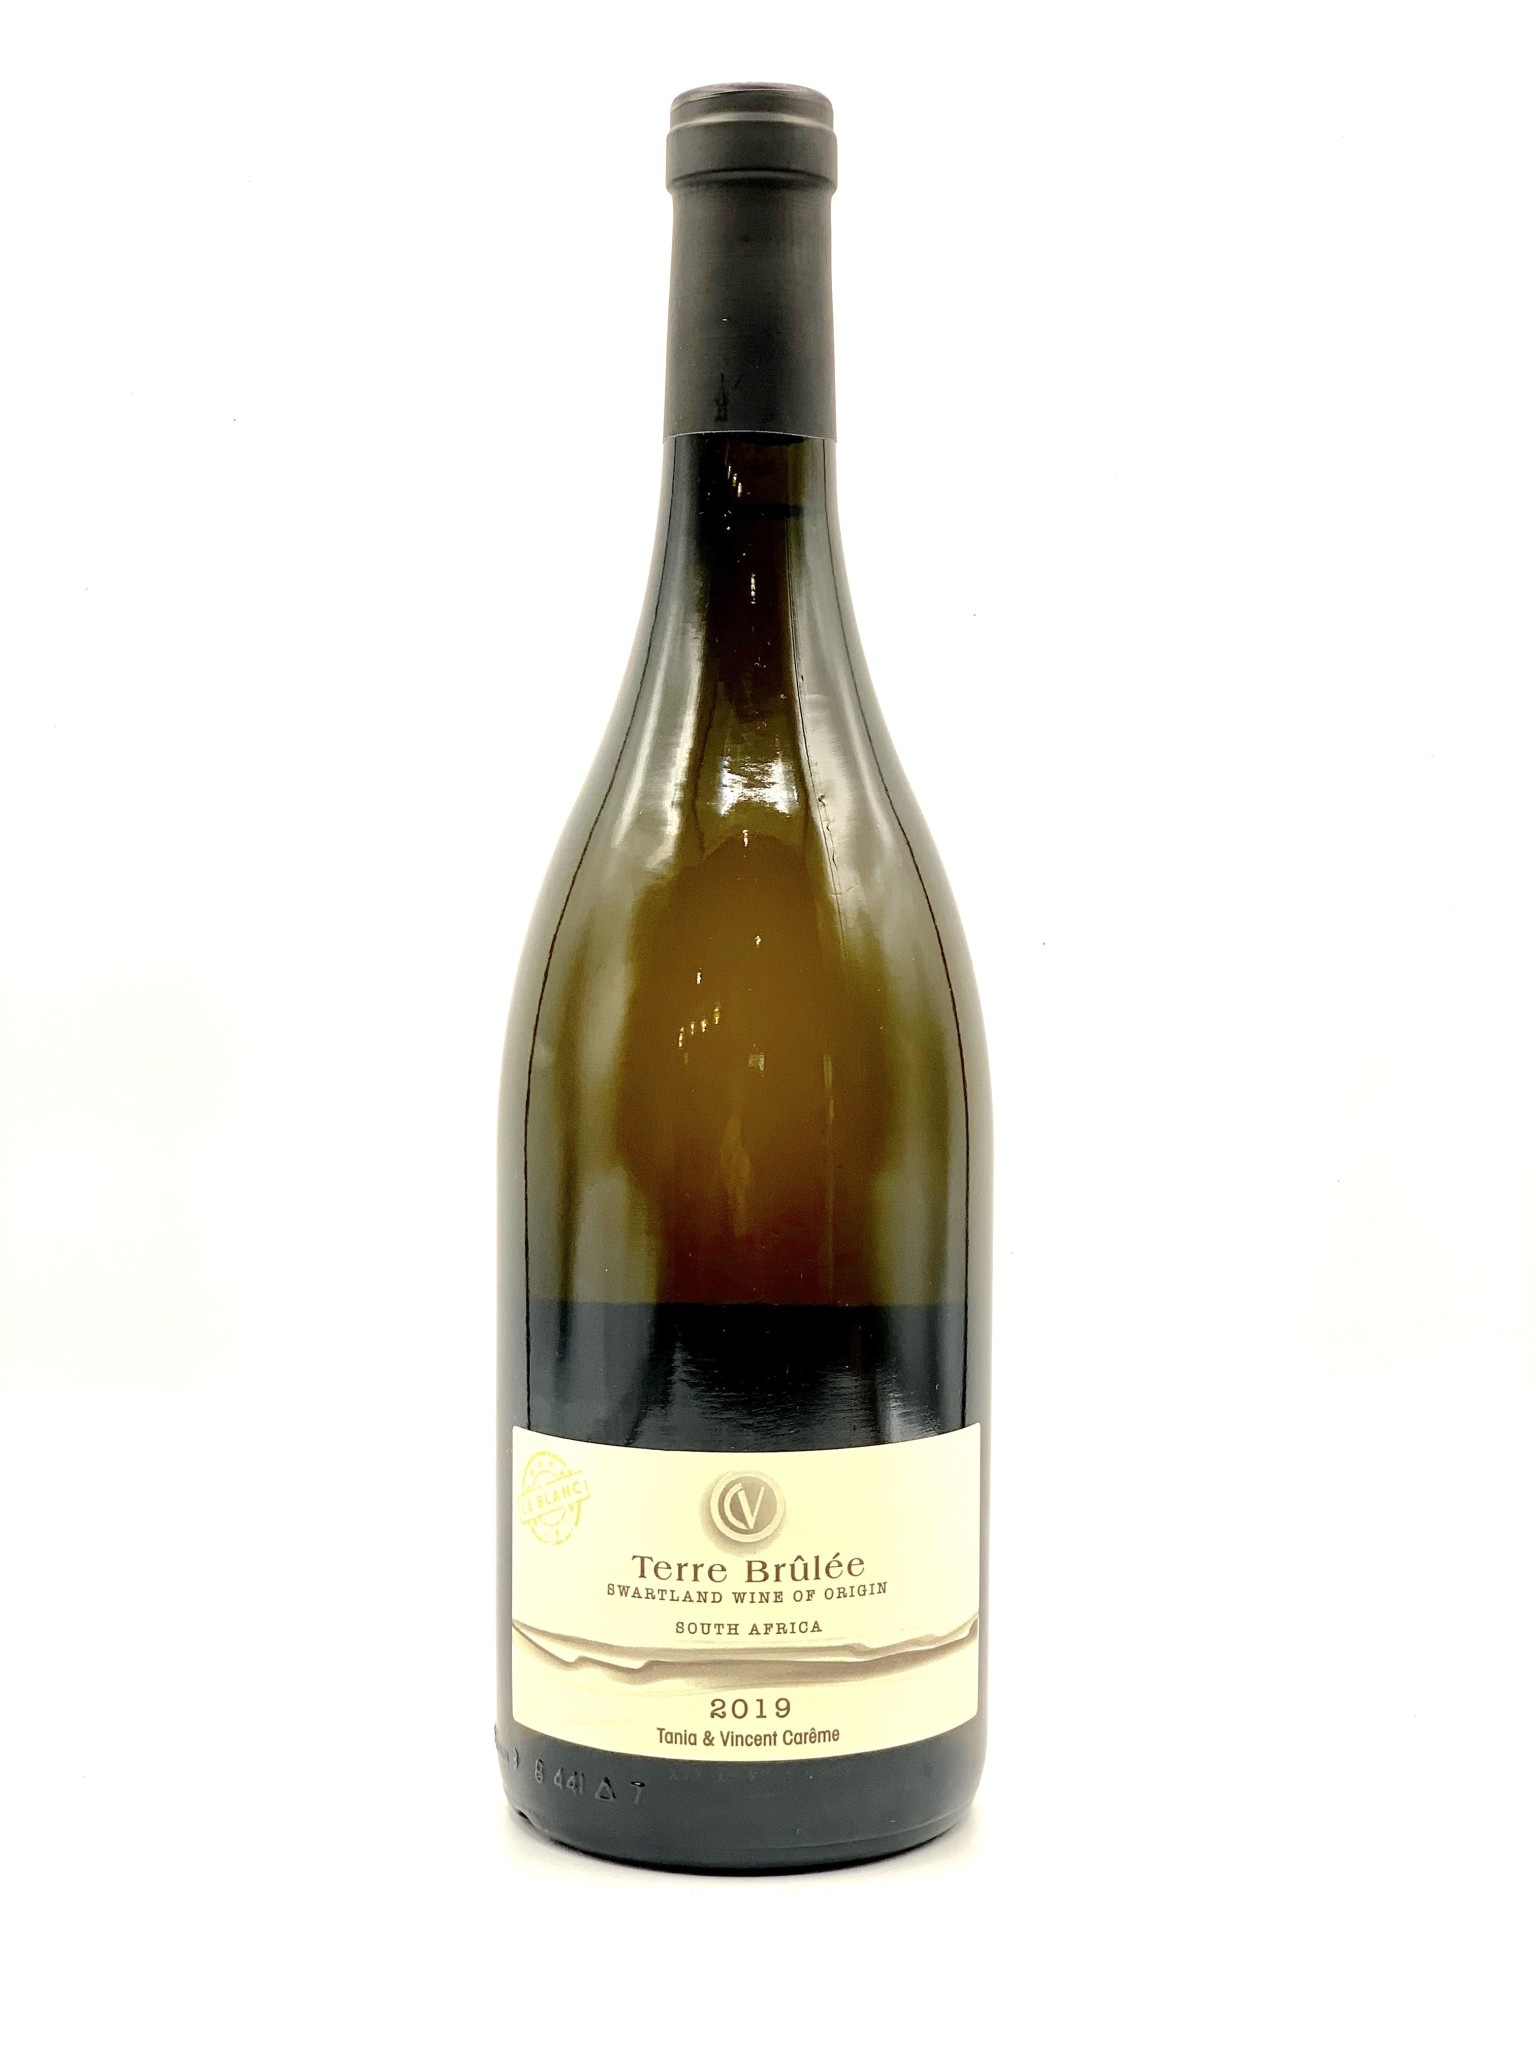 Swartland Chenin Blanc 2019 Terre Brulee  750ml